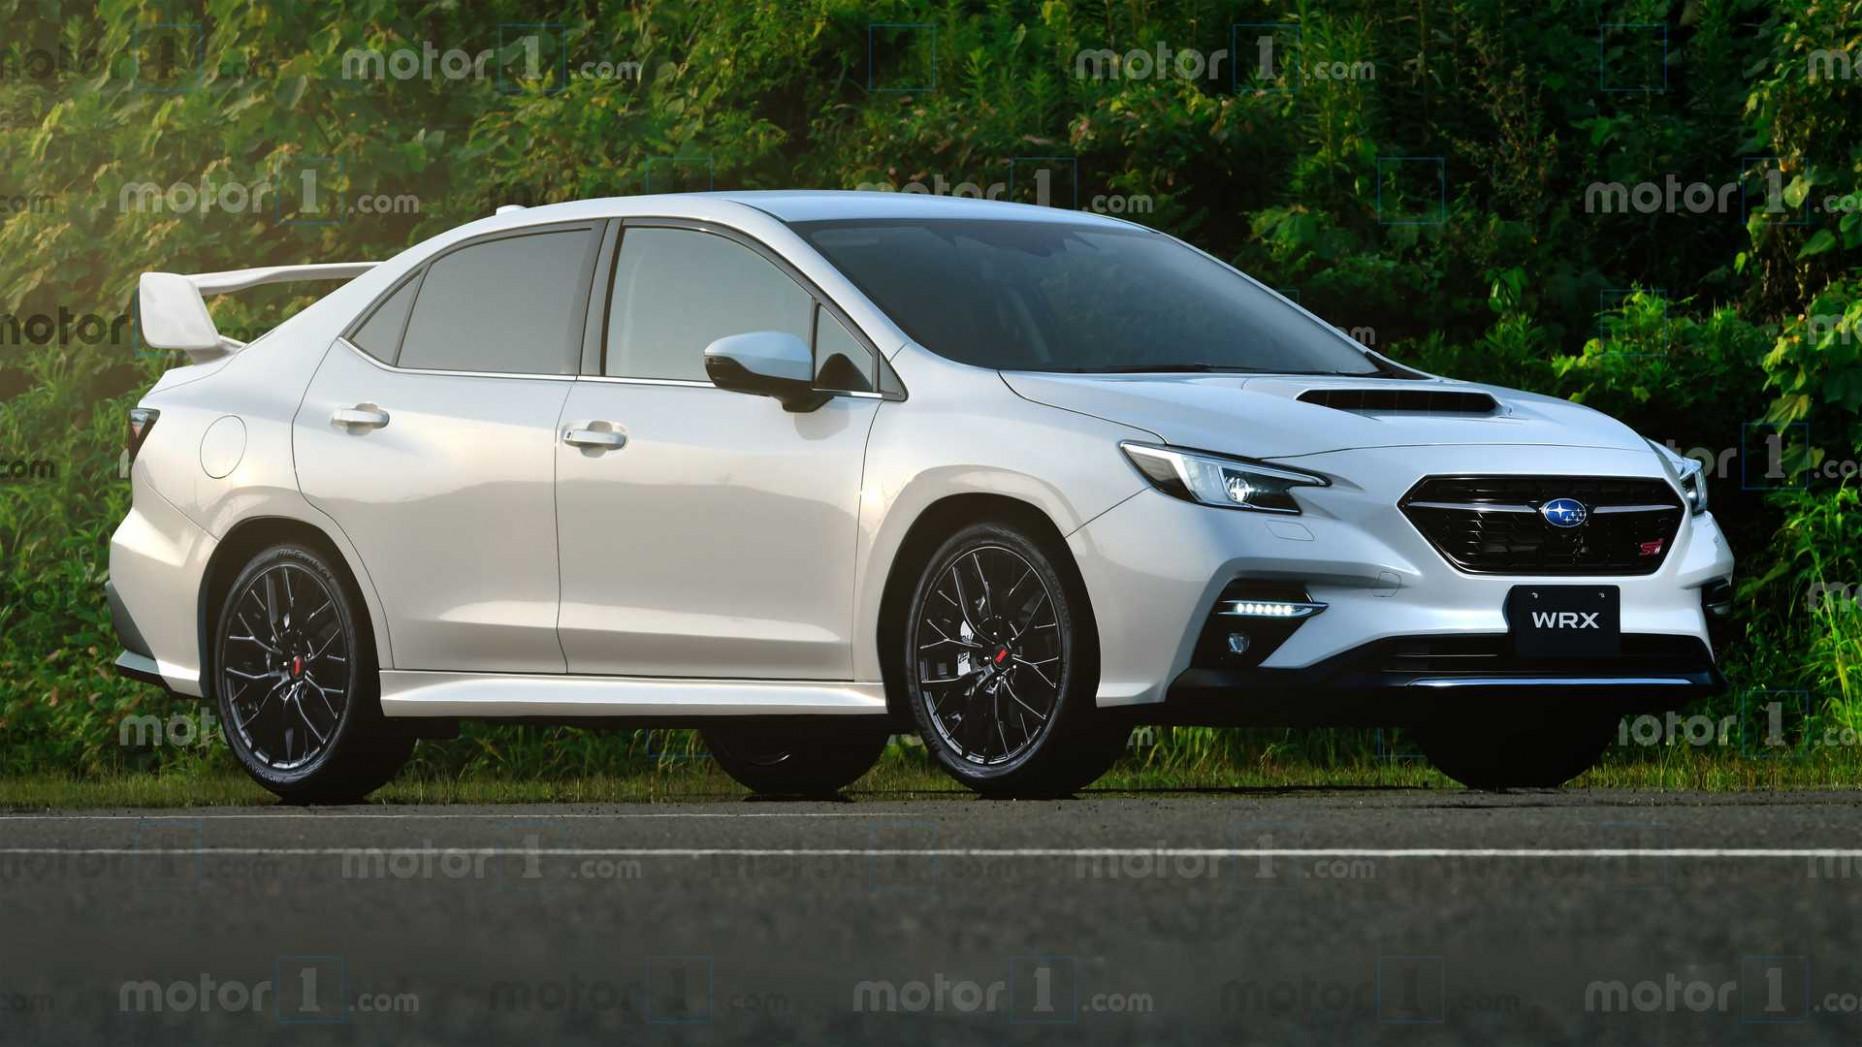 Photos 2022 Subaru Wrx